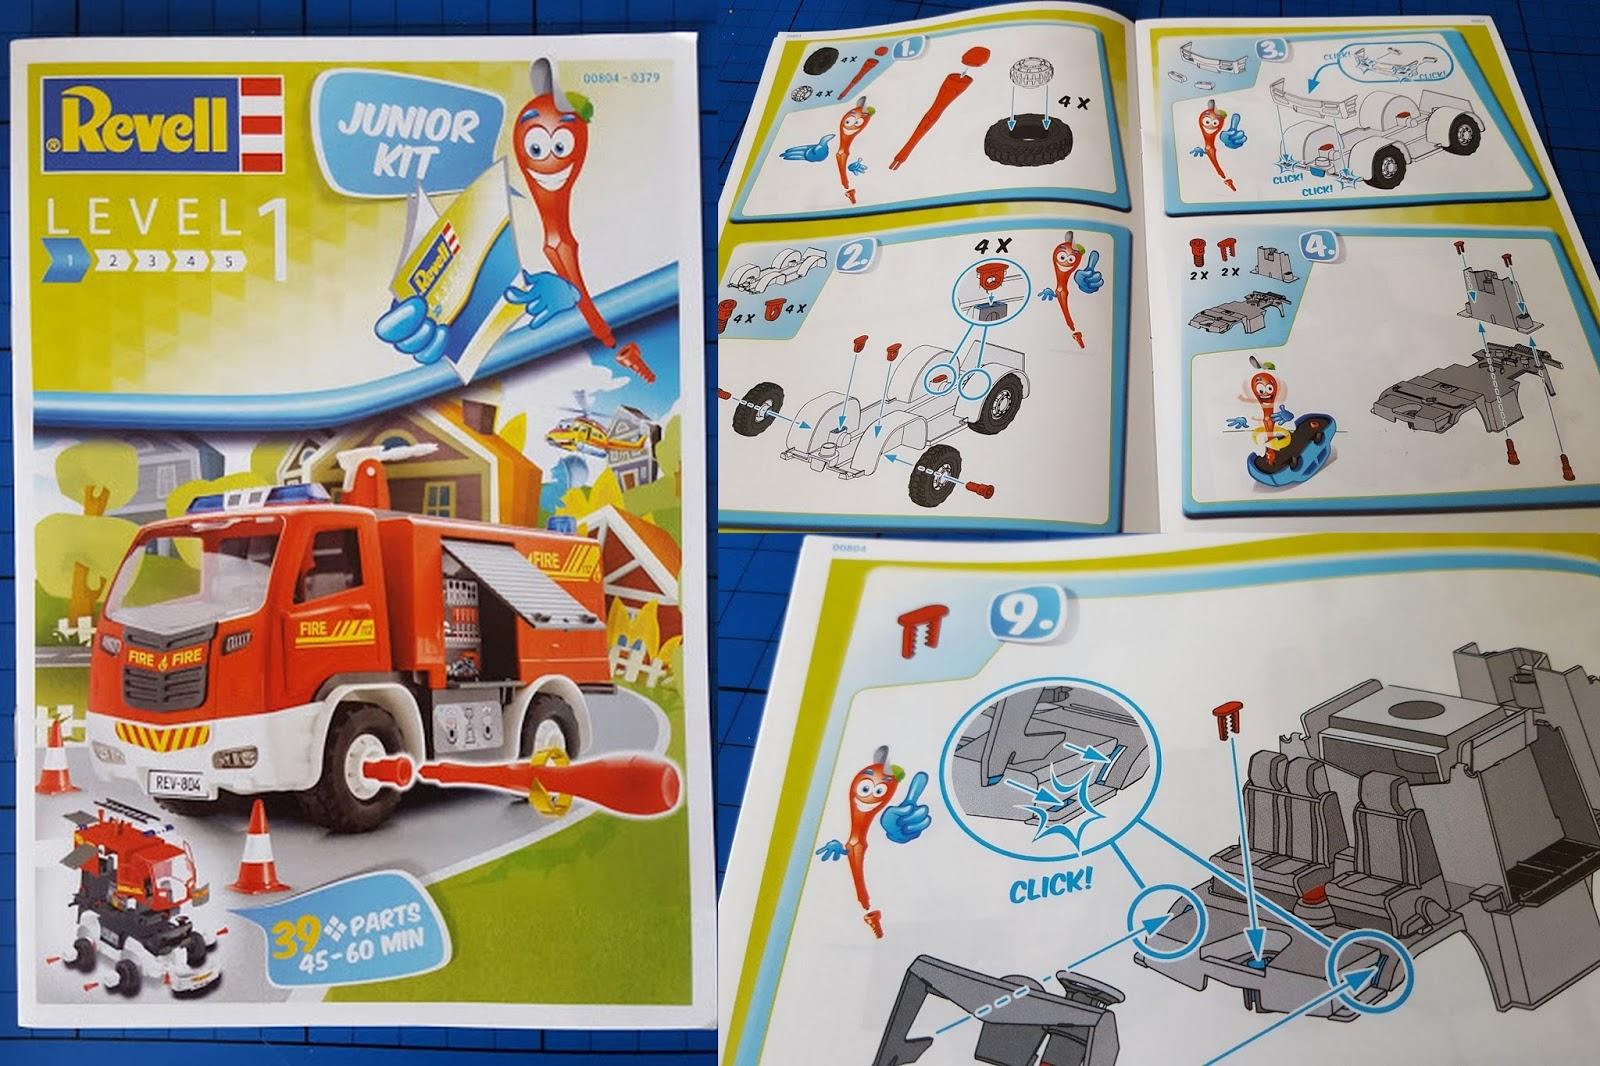 The Brick Castle: Revell Junior Kit Stage 1 Fire Engine Model Kit